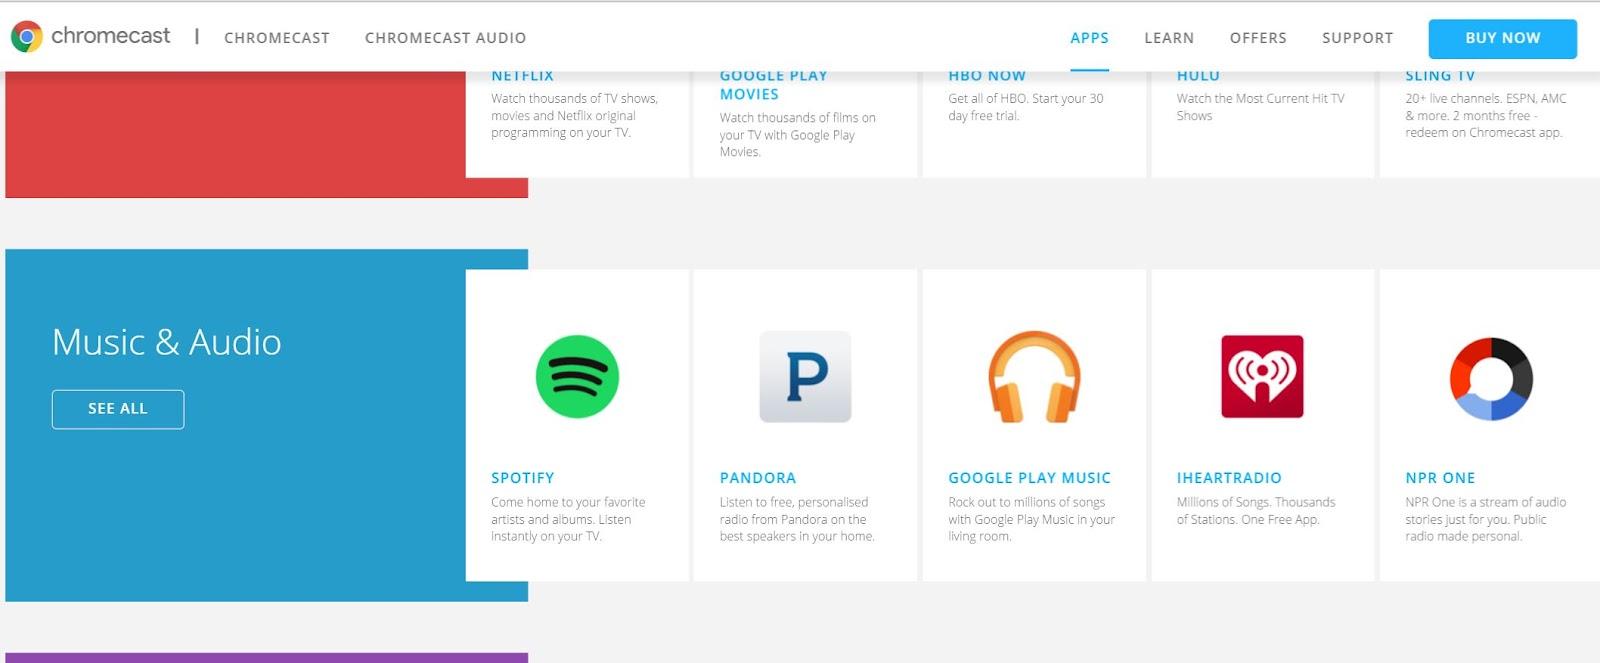 Pandora, installed on Windows 10 platform doesn't offer casting